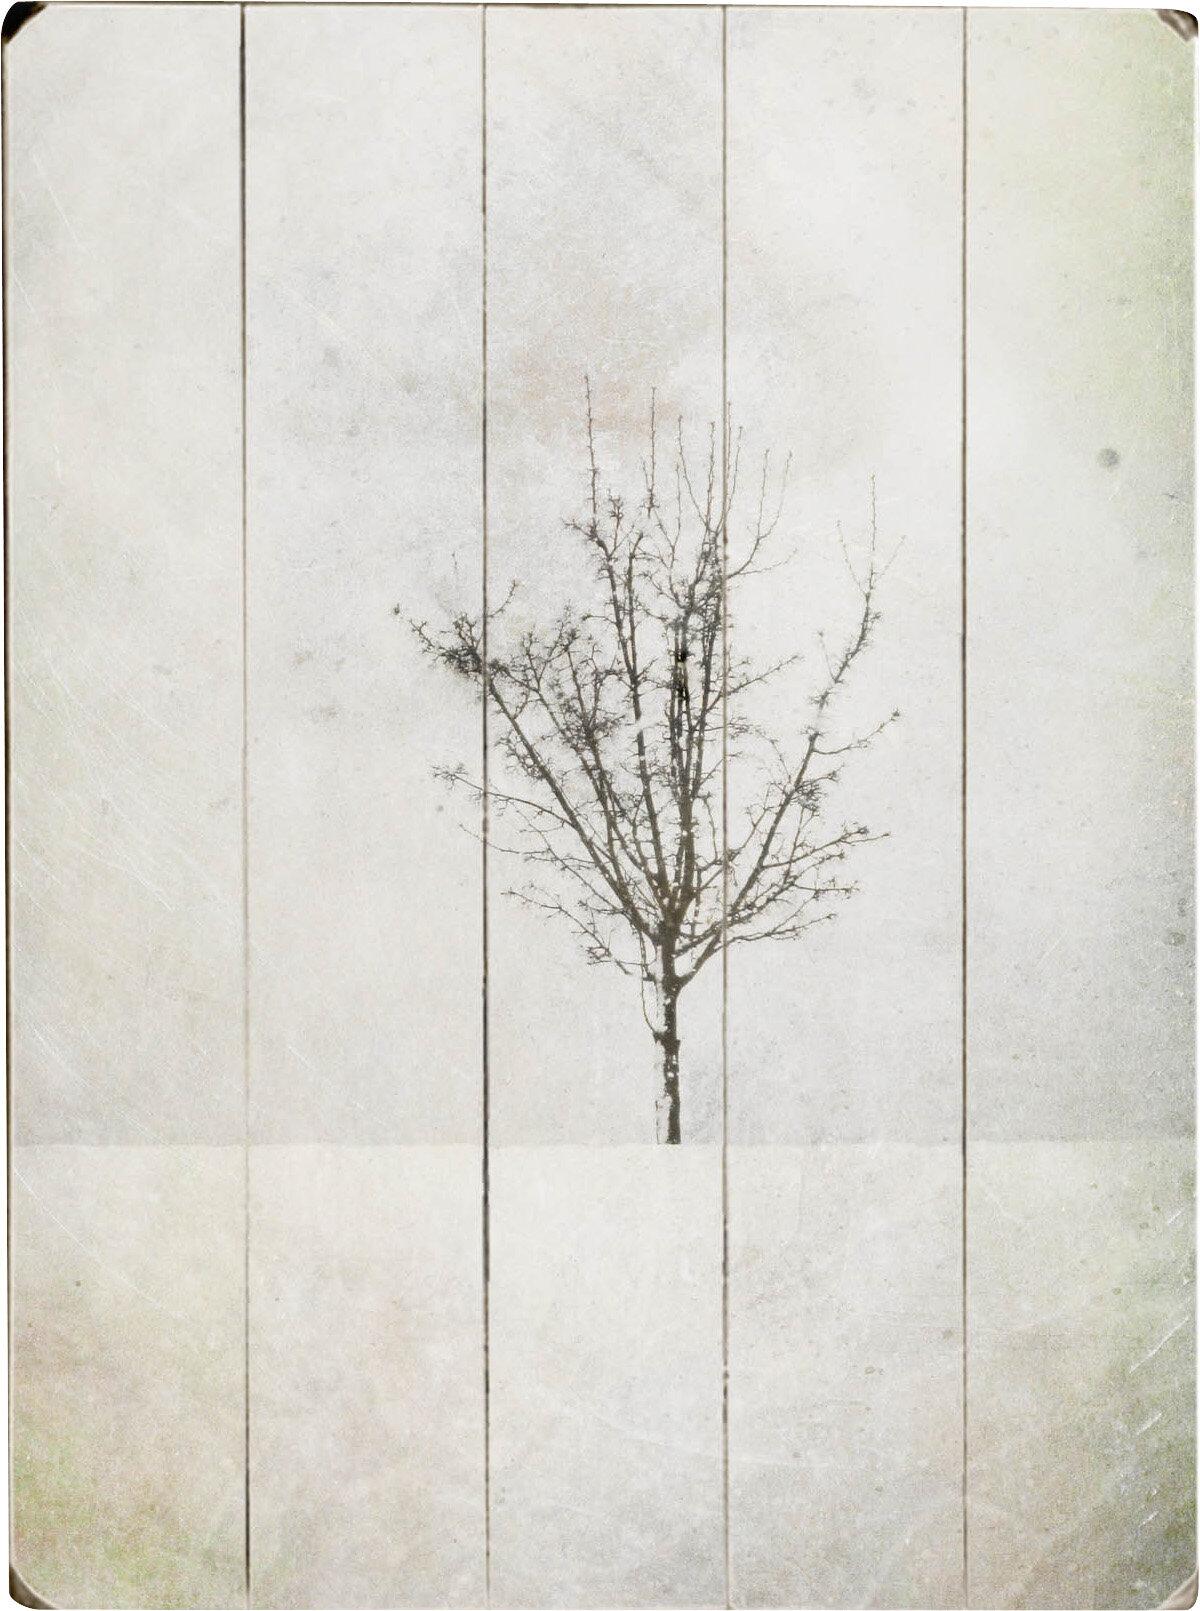 Artehouse Llc Solitary Graphic Art Multi Piece Image On Wood Wayfair